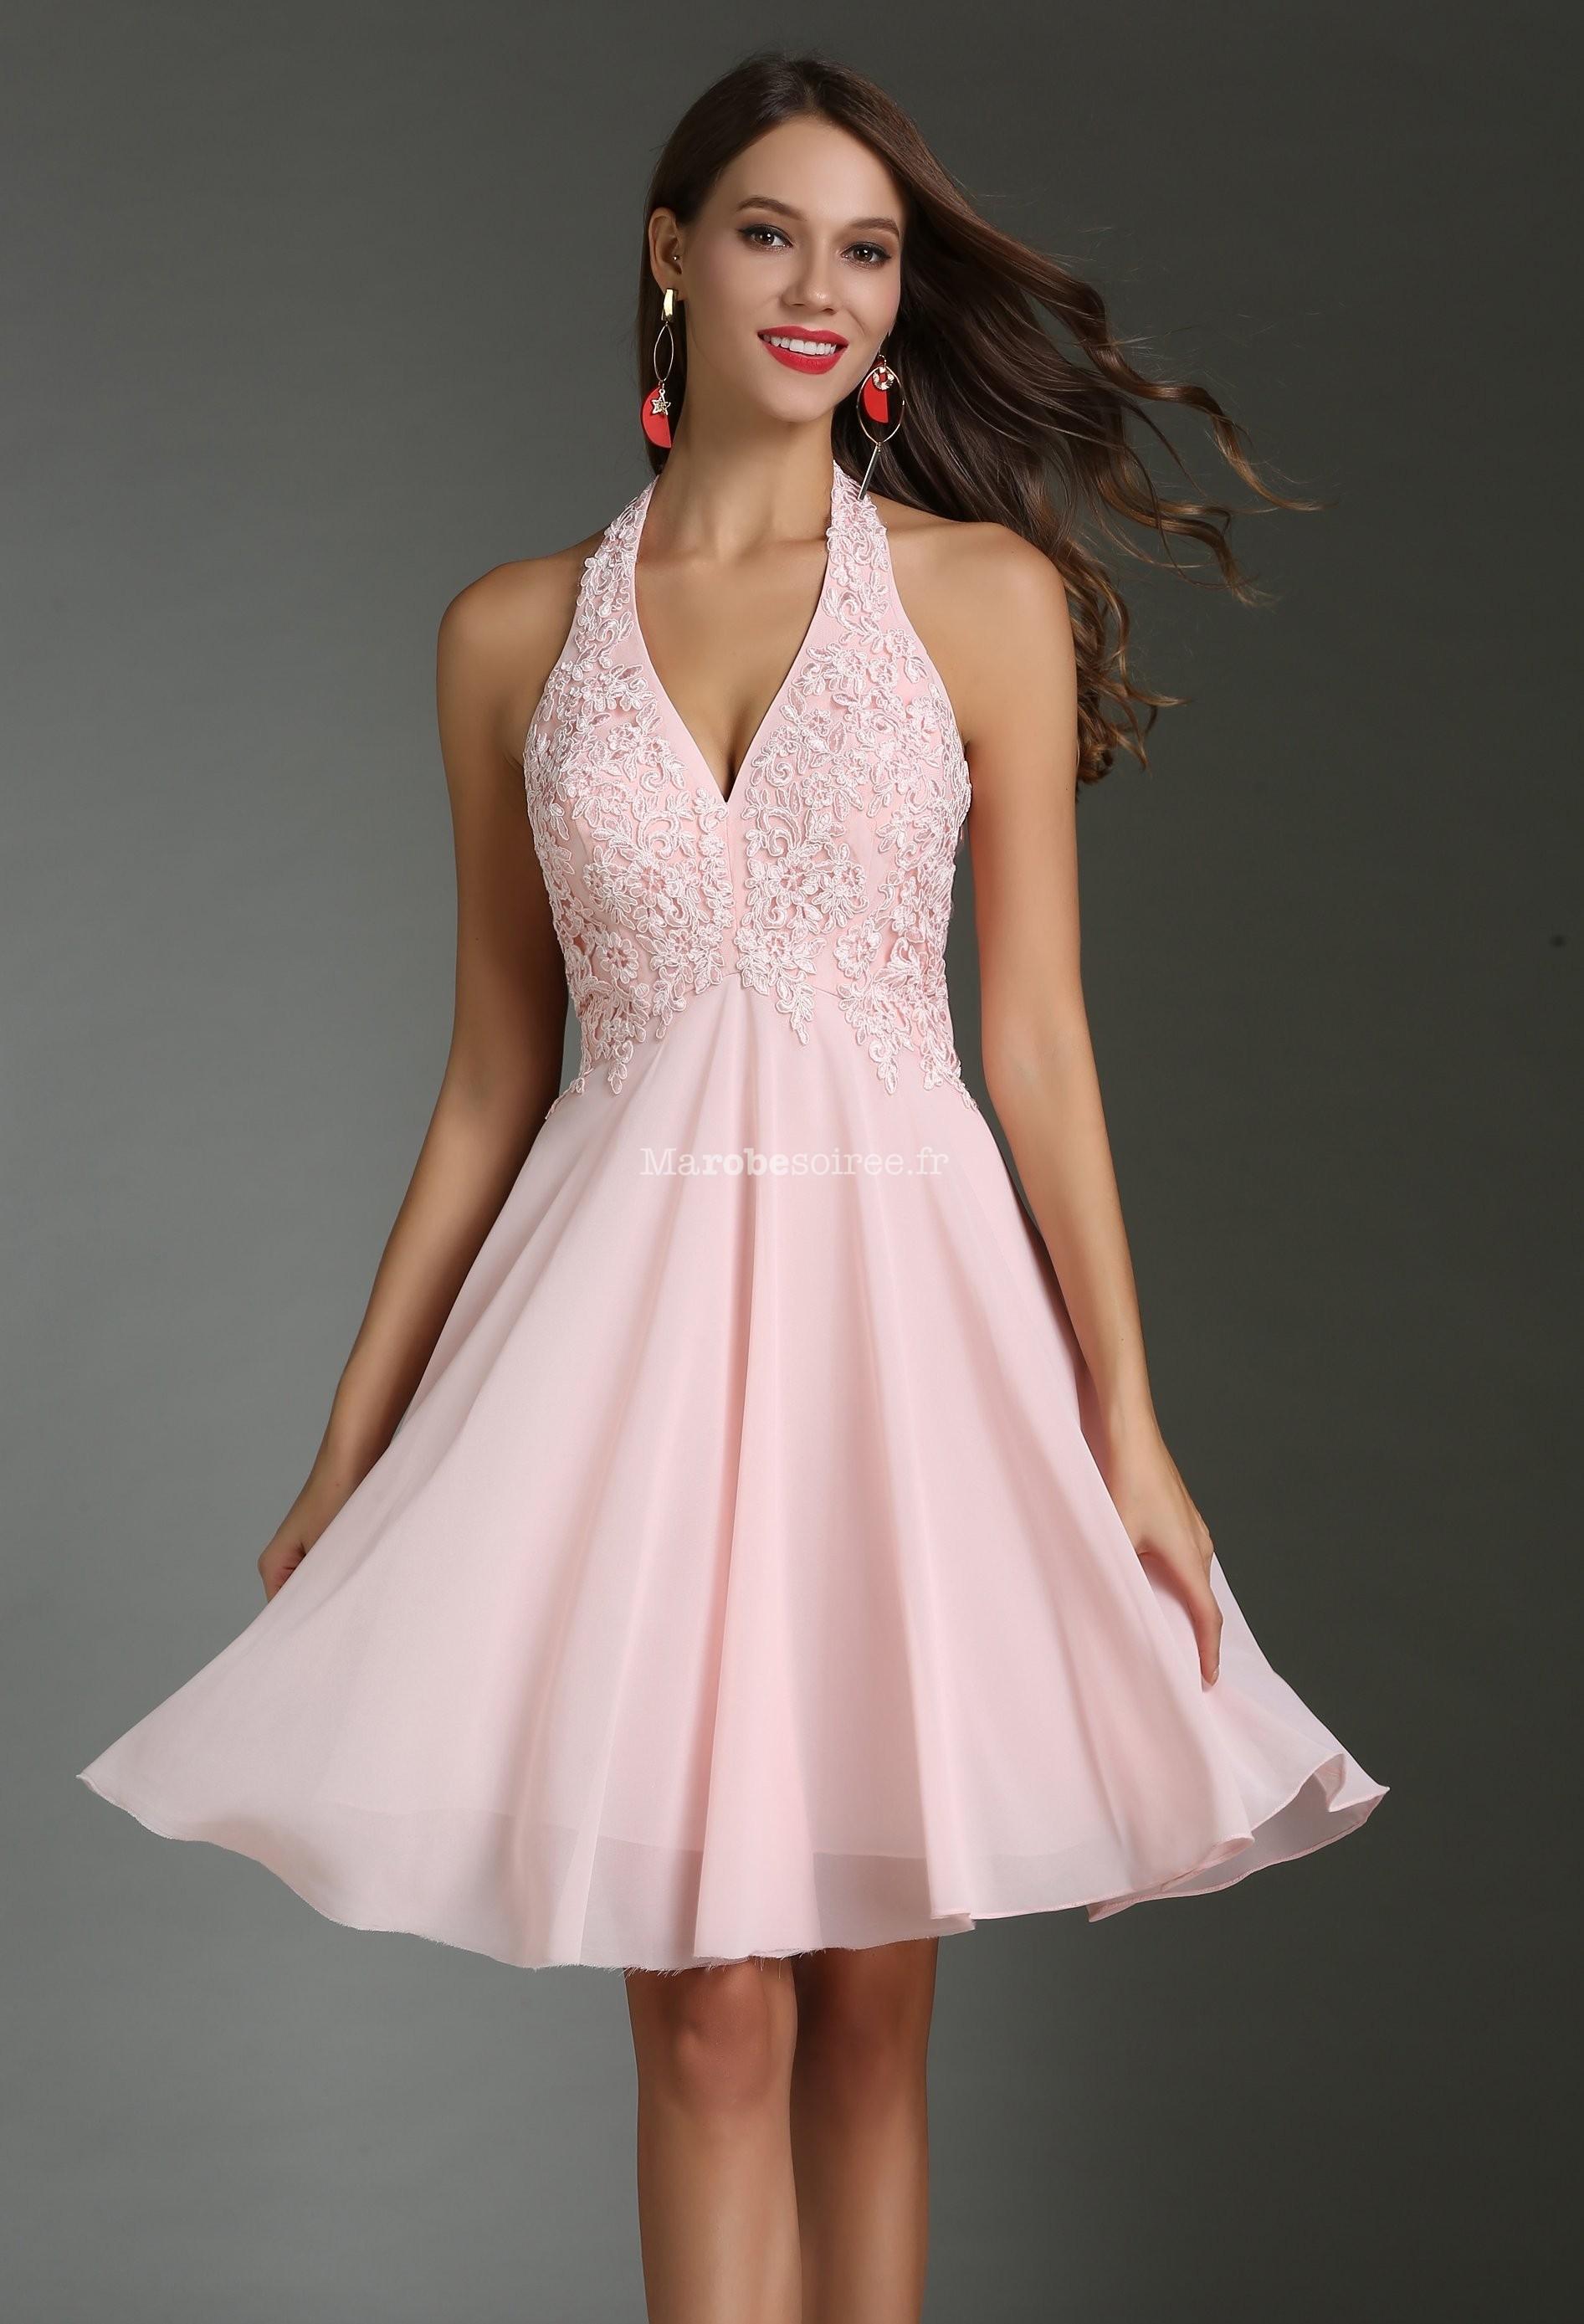 robe de soir e rose poudr dentelle guipure. Black Bedroom Furniture Sets. Home Design Ideas